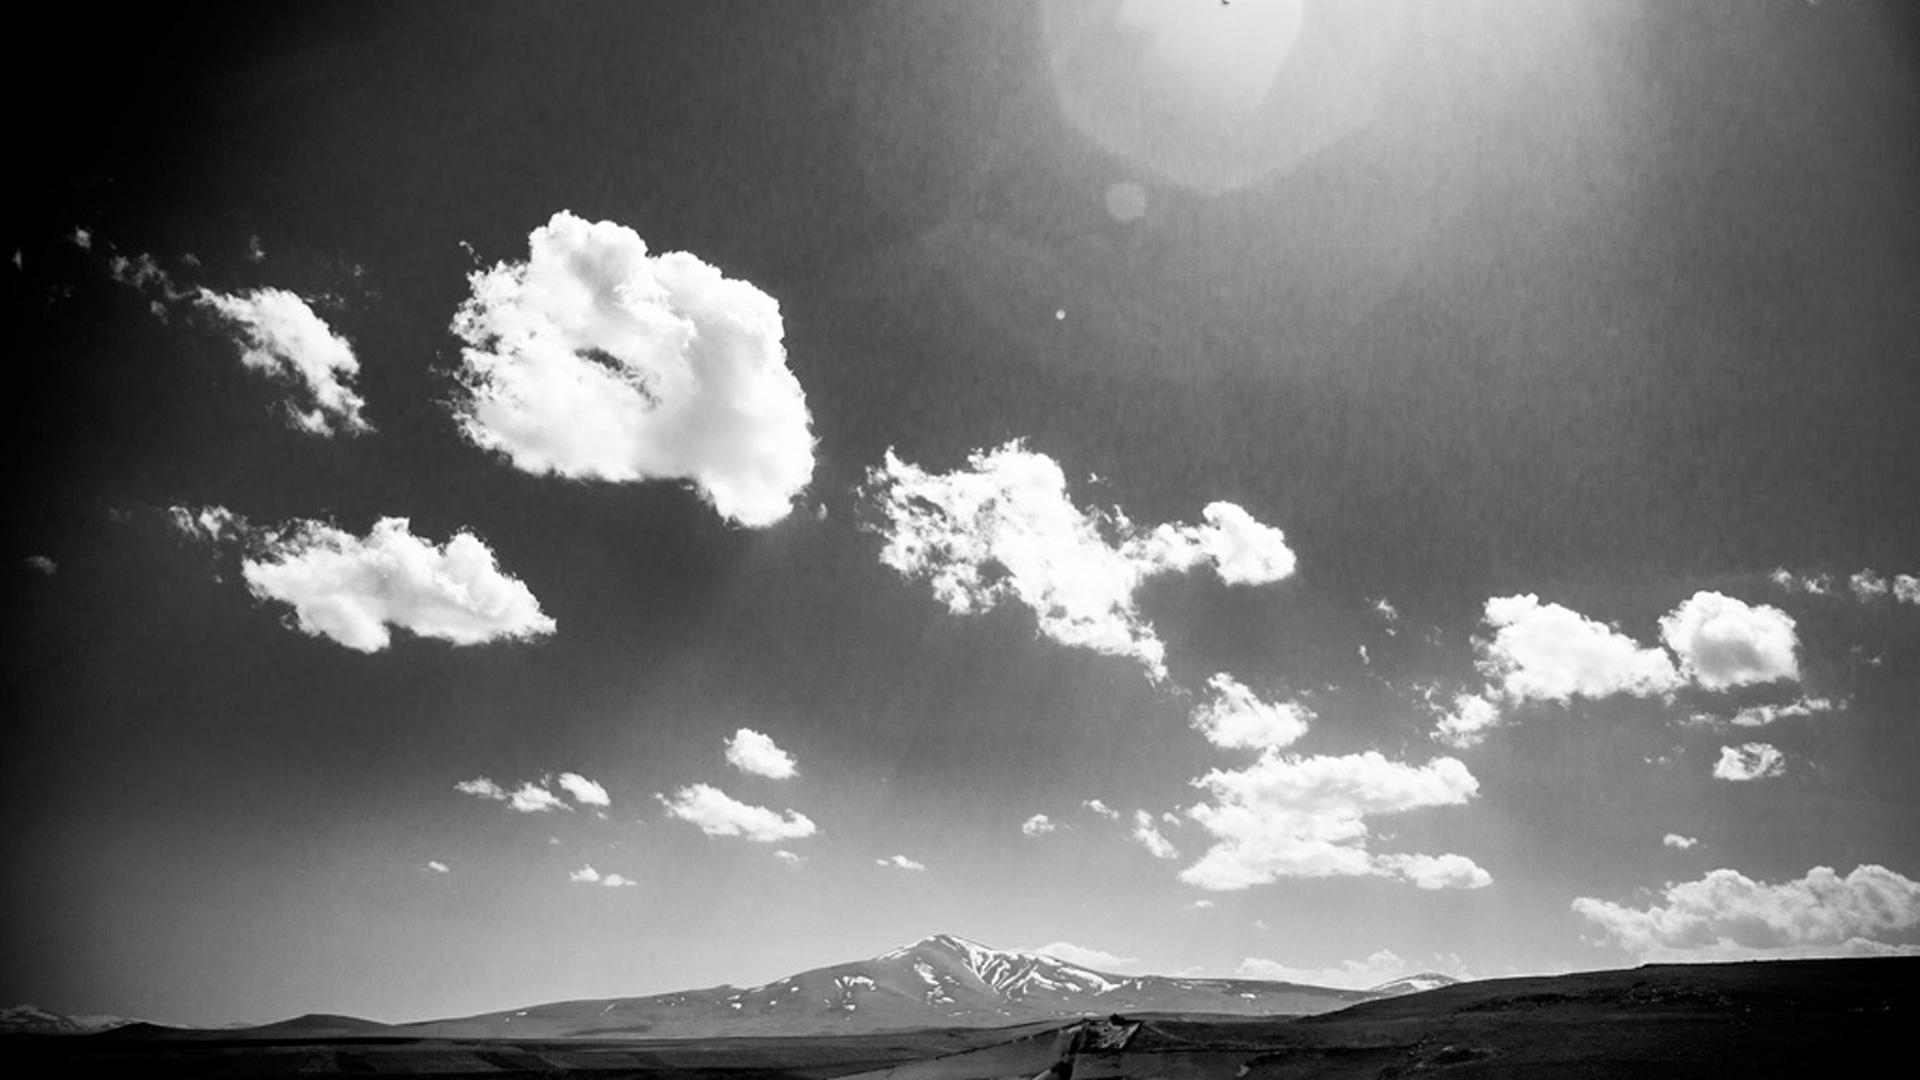 Clouds in the Armenian sky